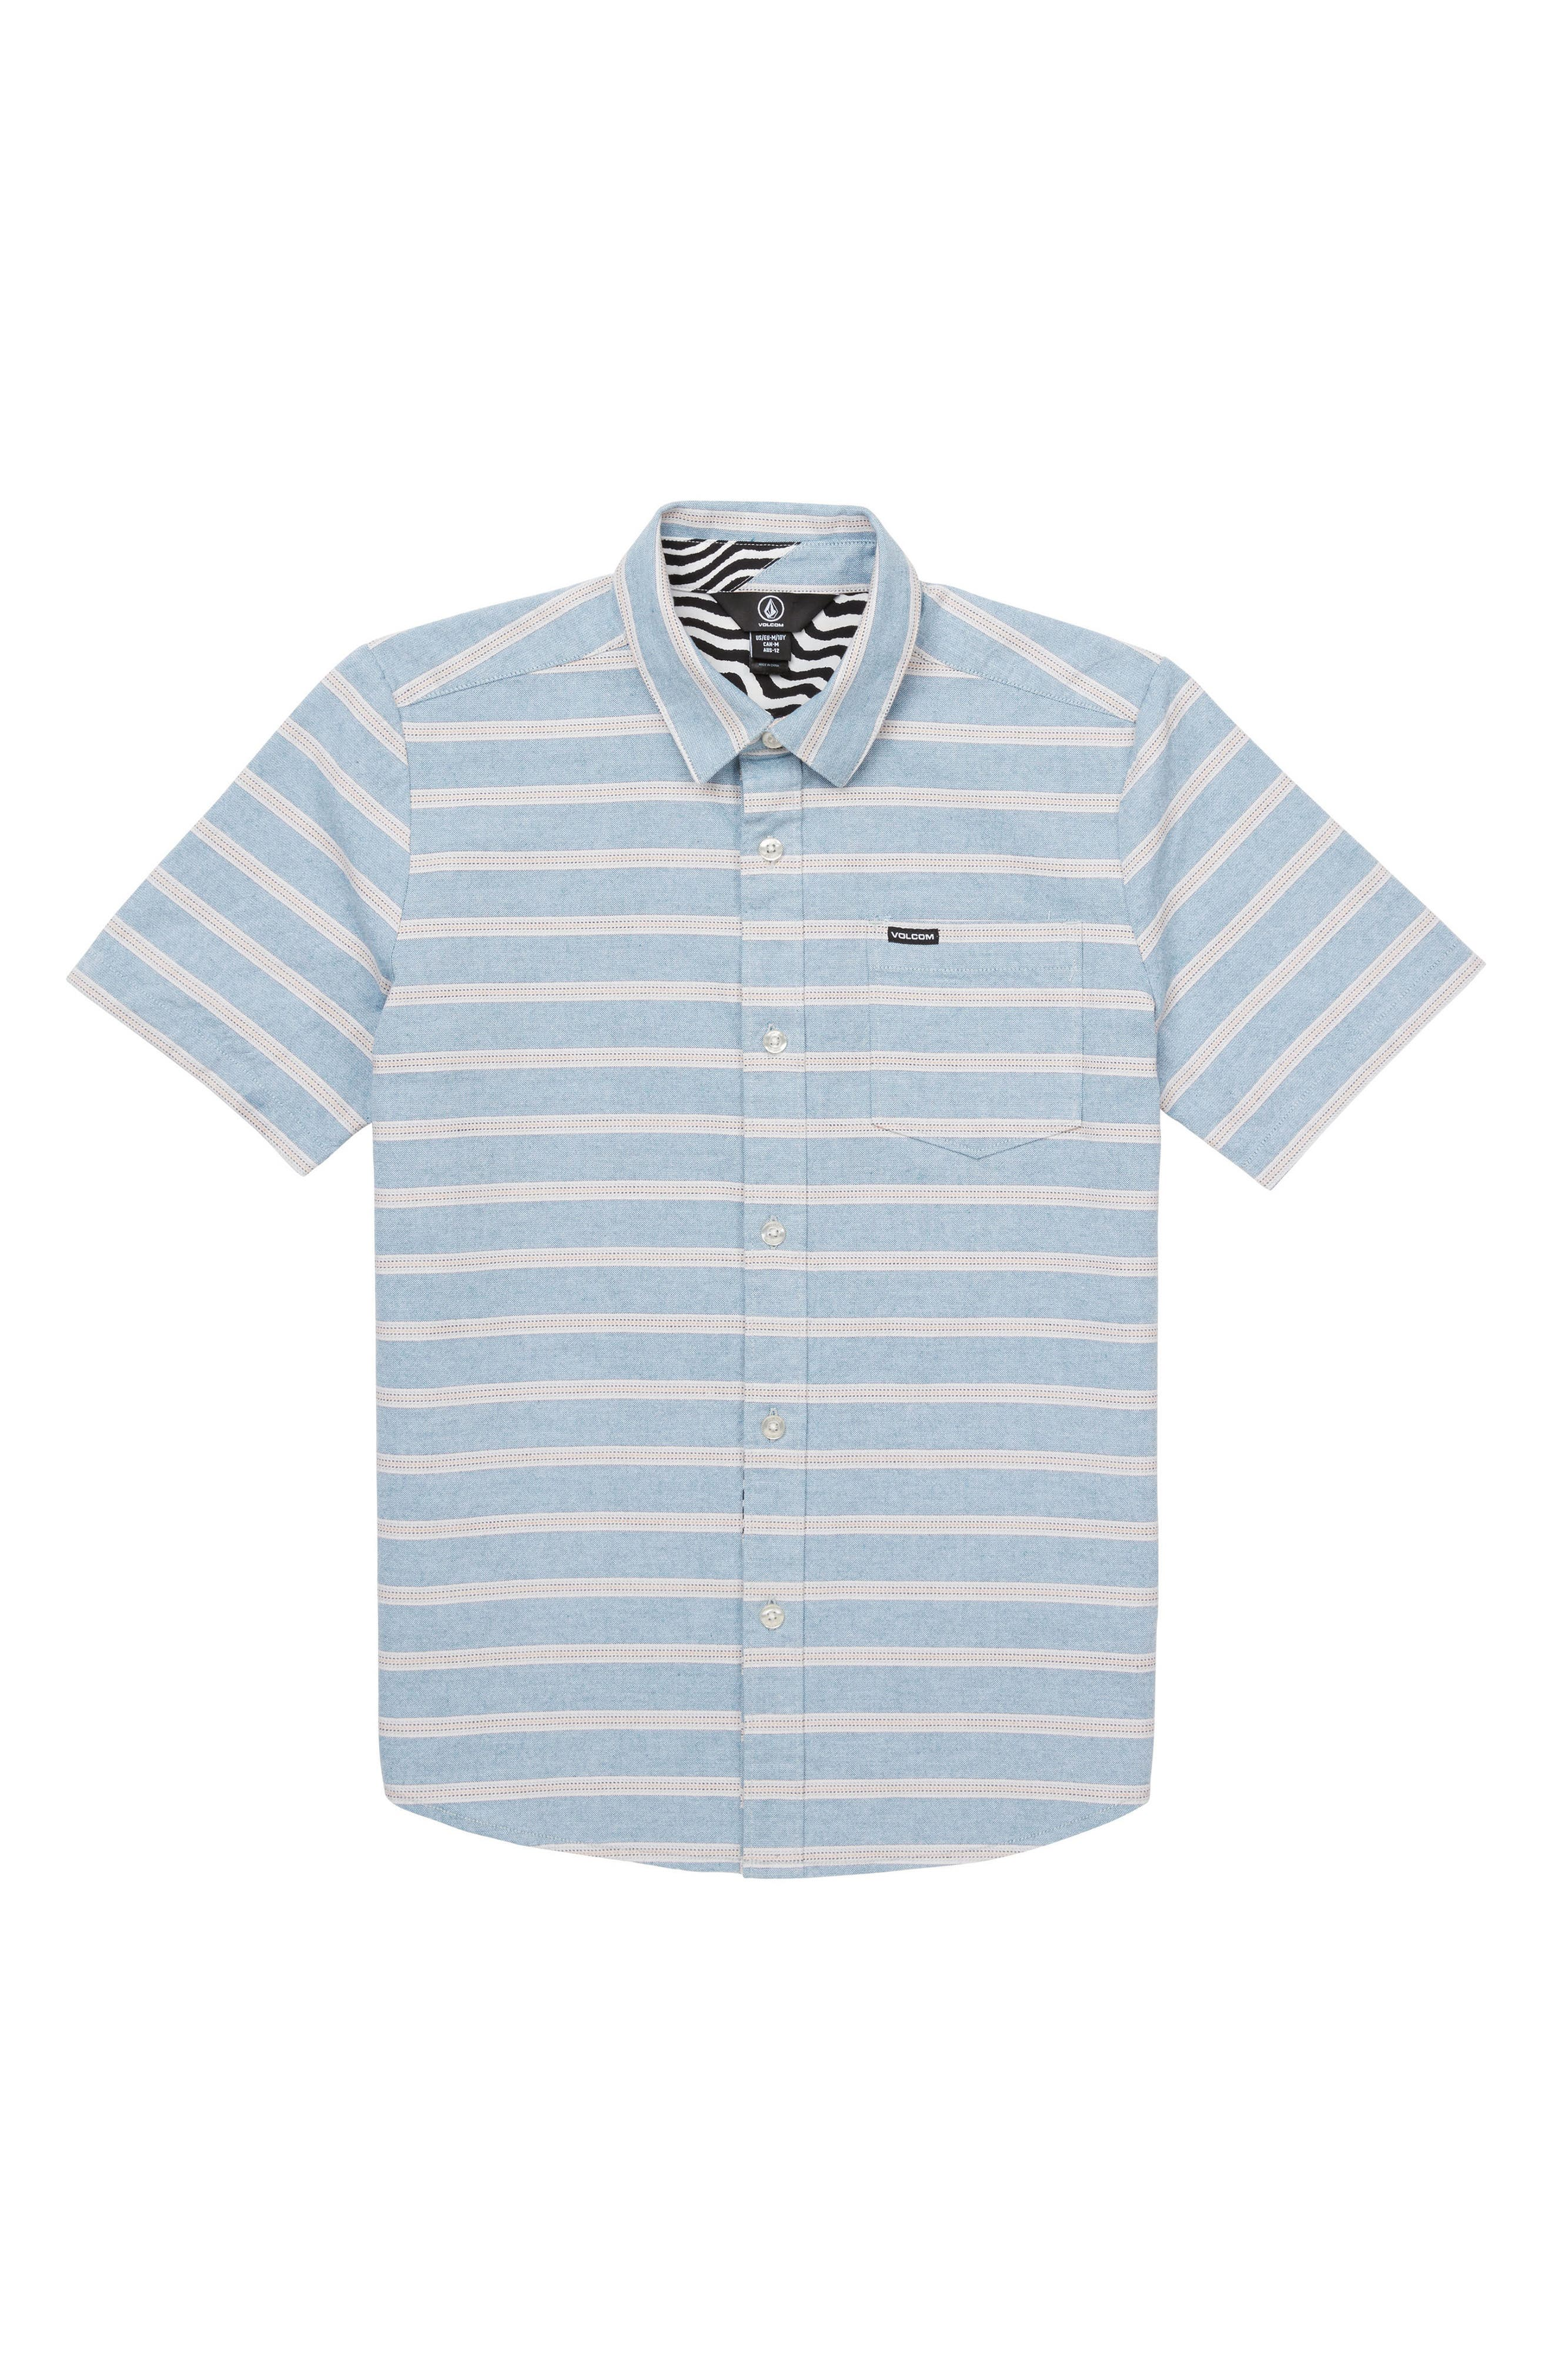 Branson Woven Shirt,                             Main thumbnail 1, color,                             Vintage Blue